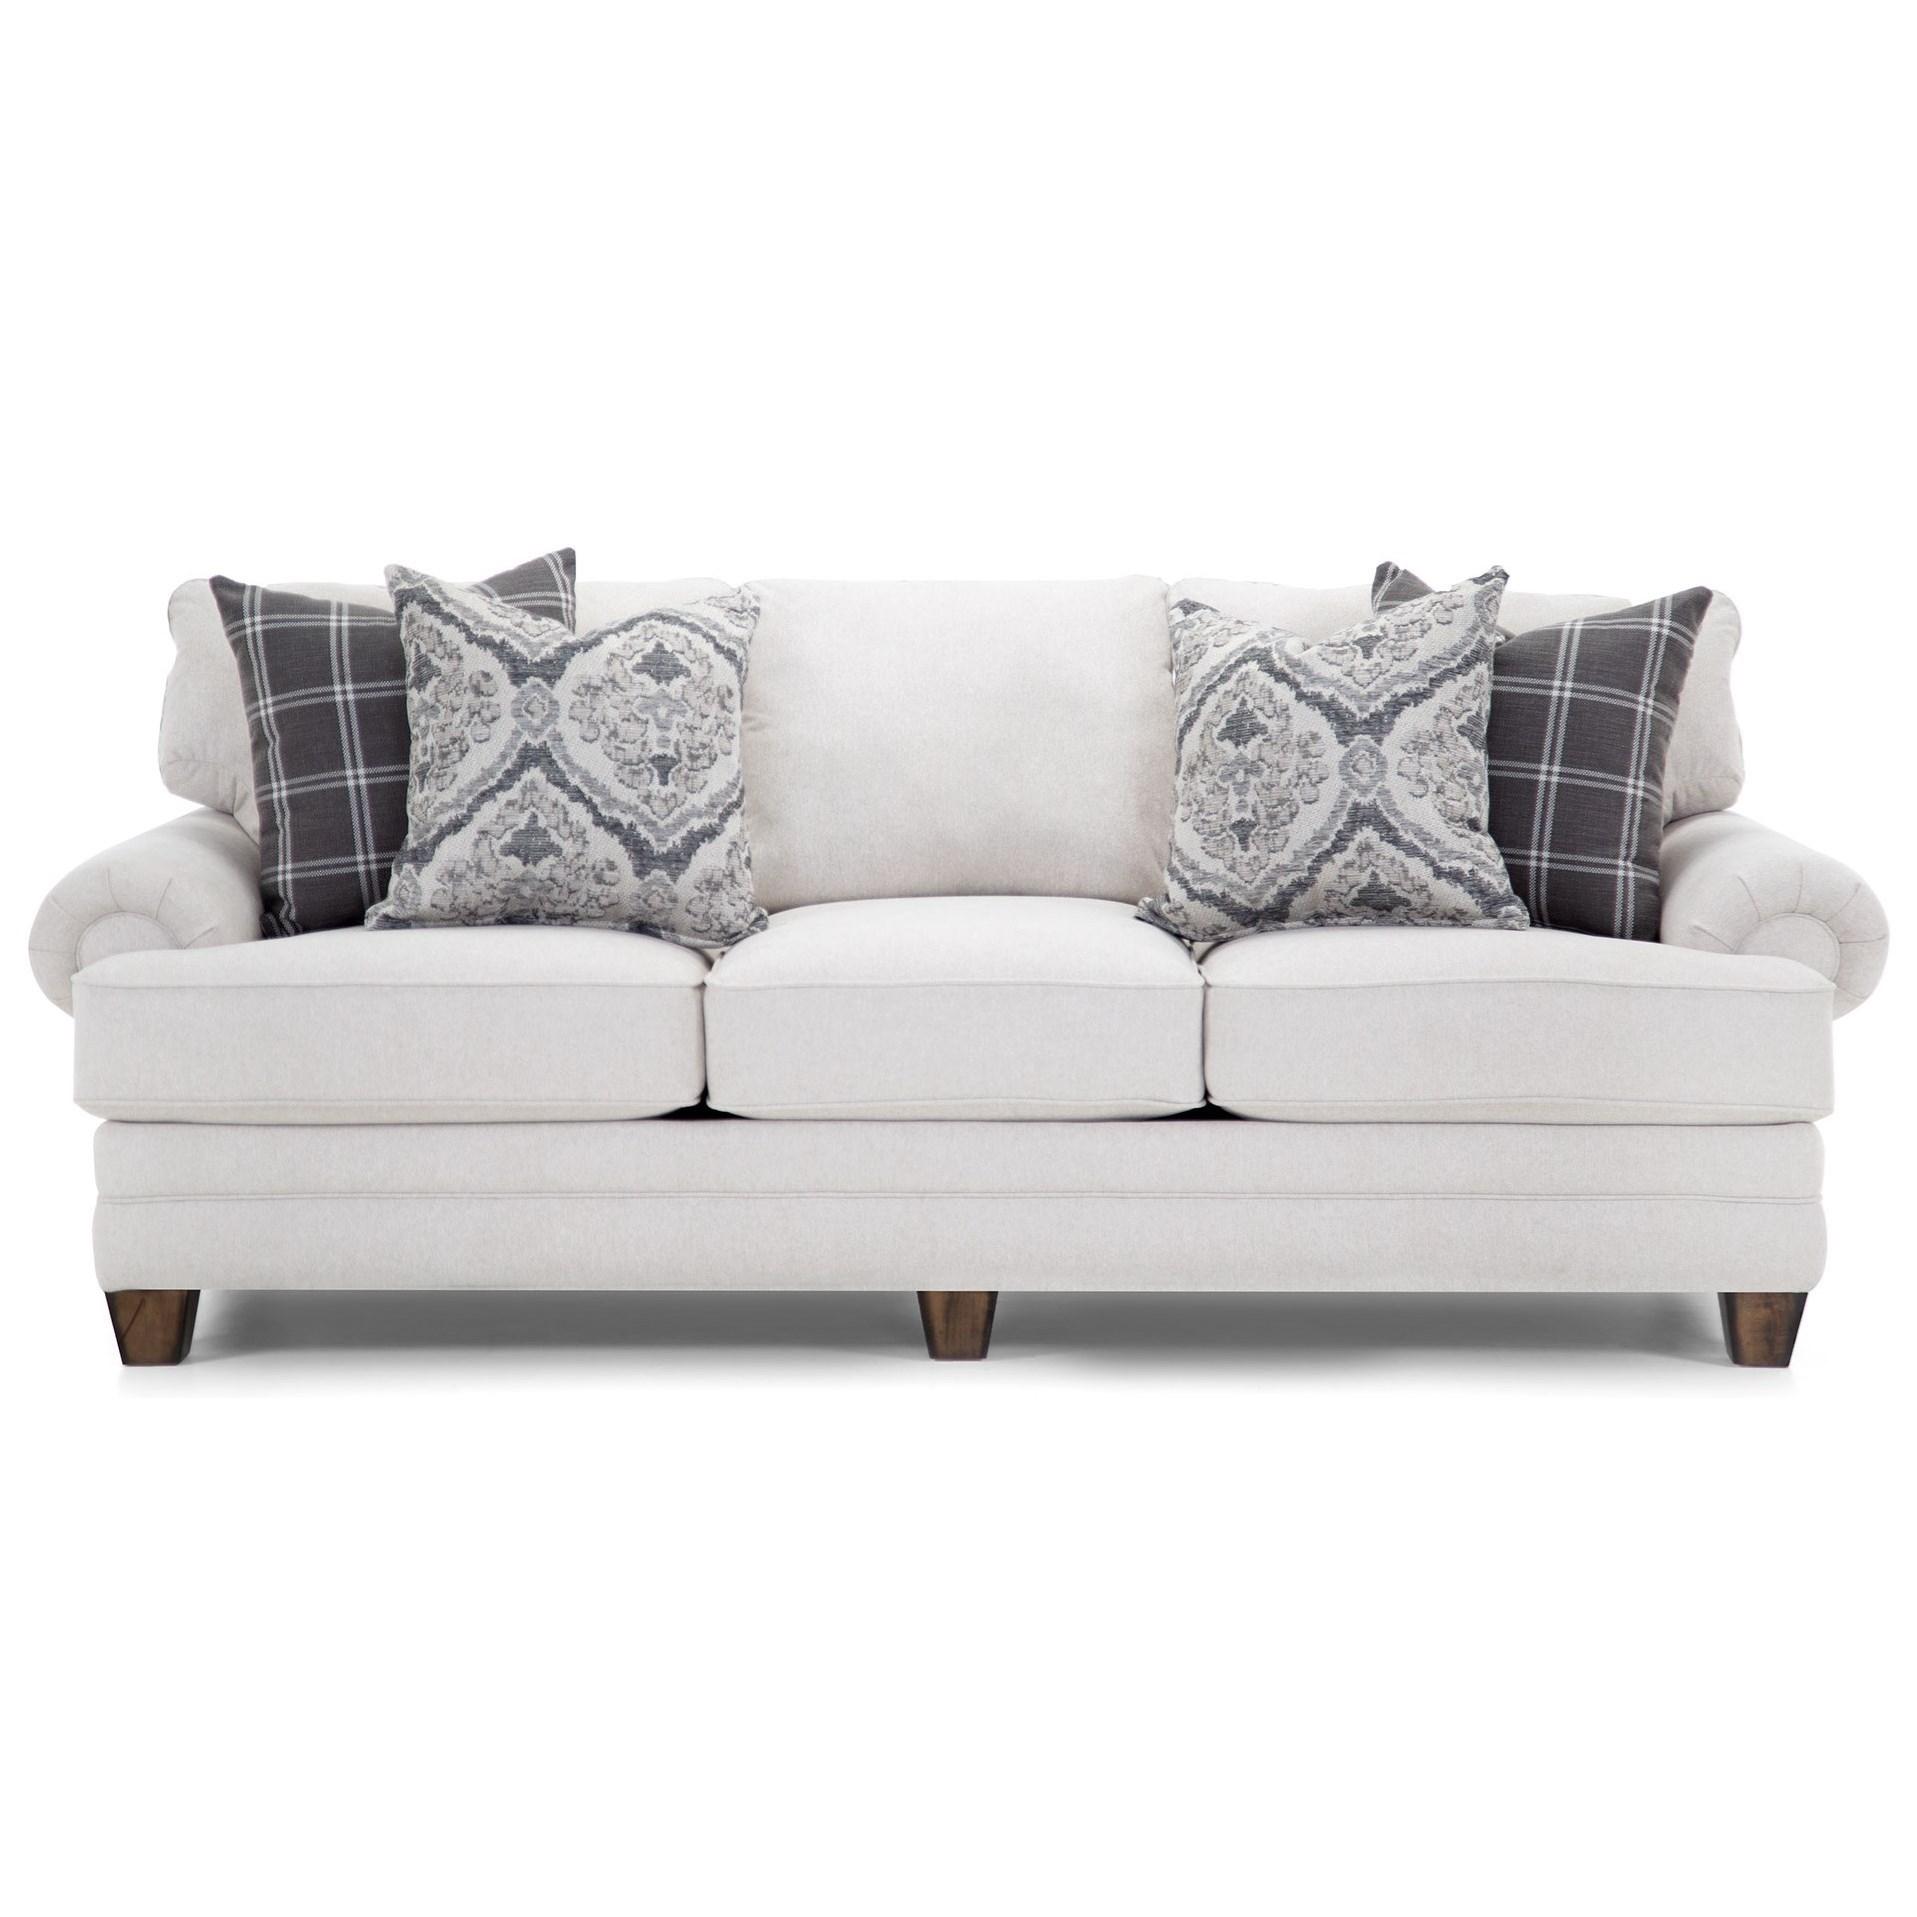 957 Sofa by Franklin at Furniture Fair - North Carolina